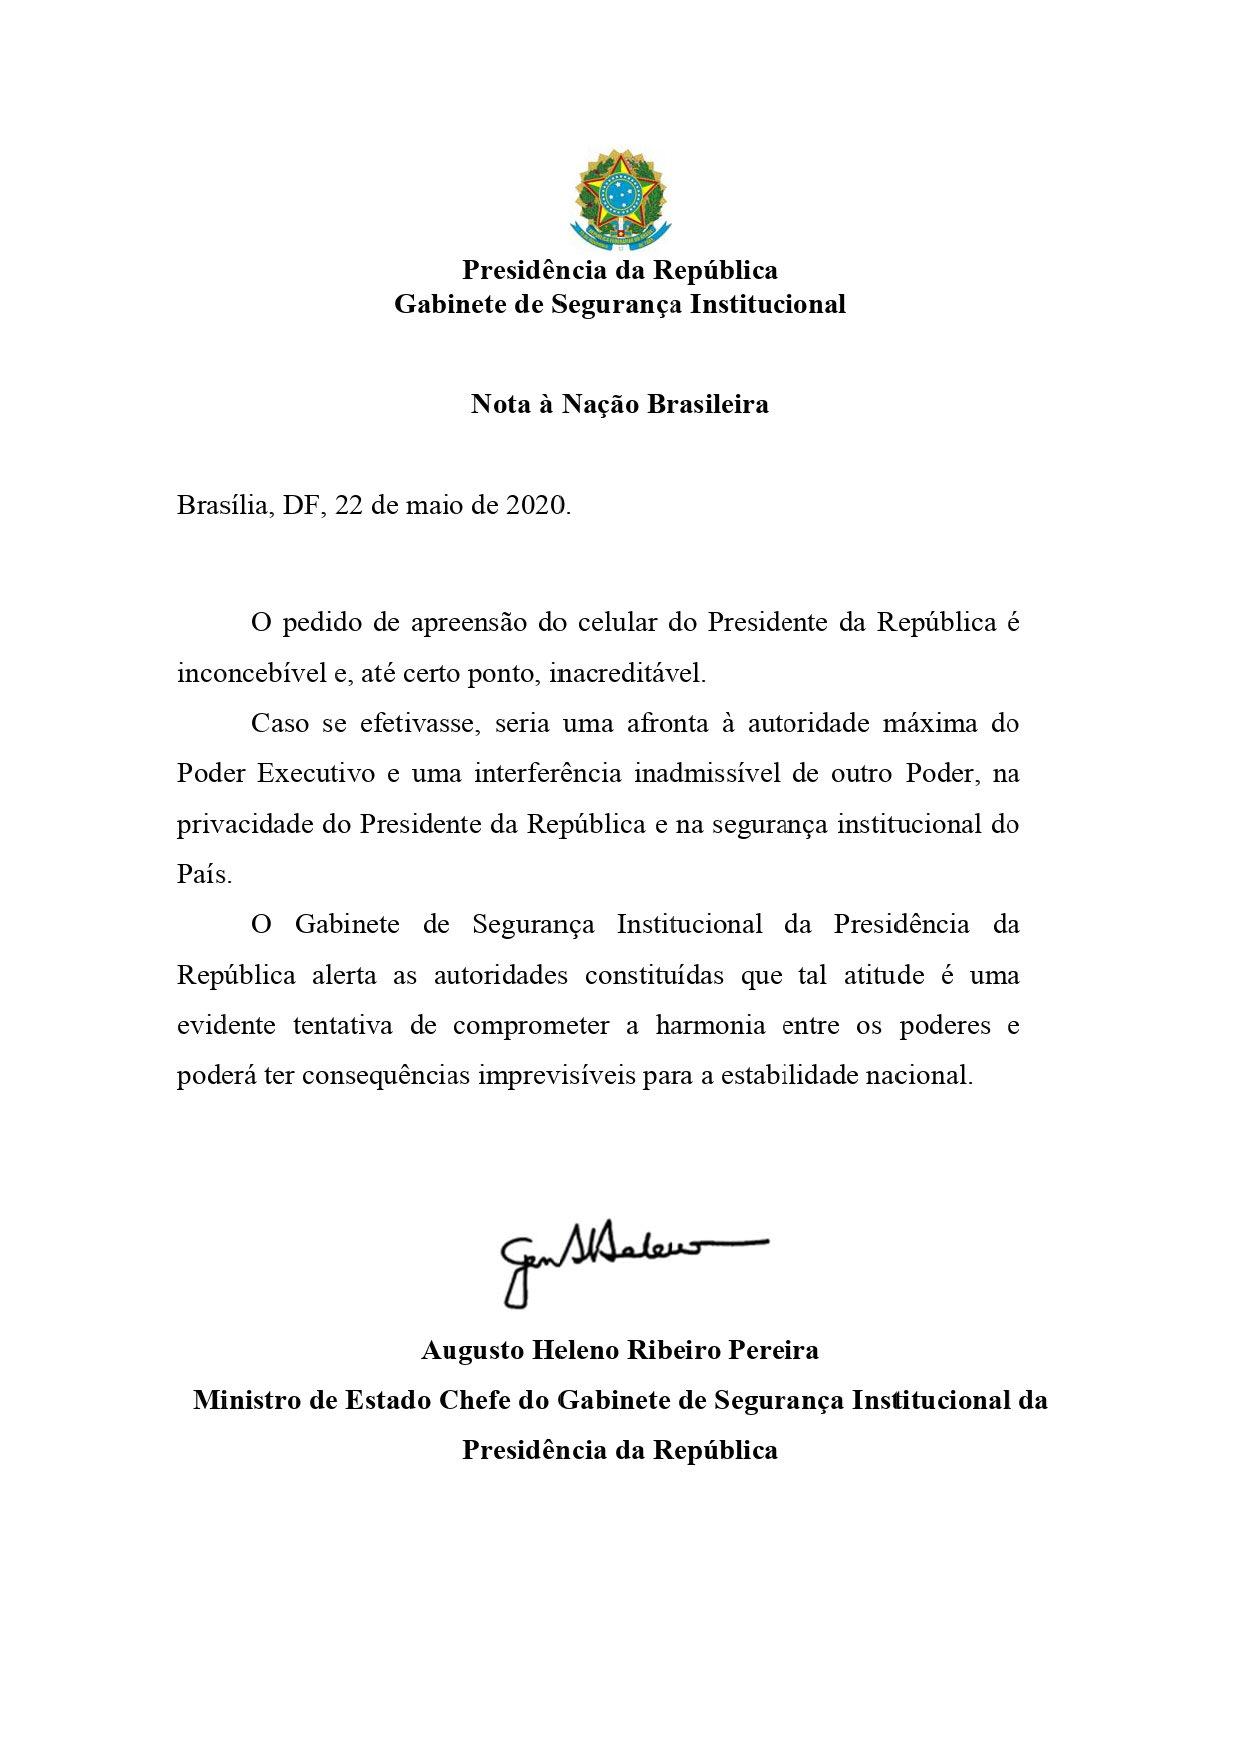 carta general heleno